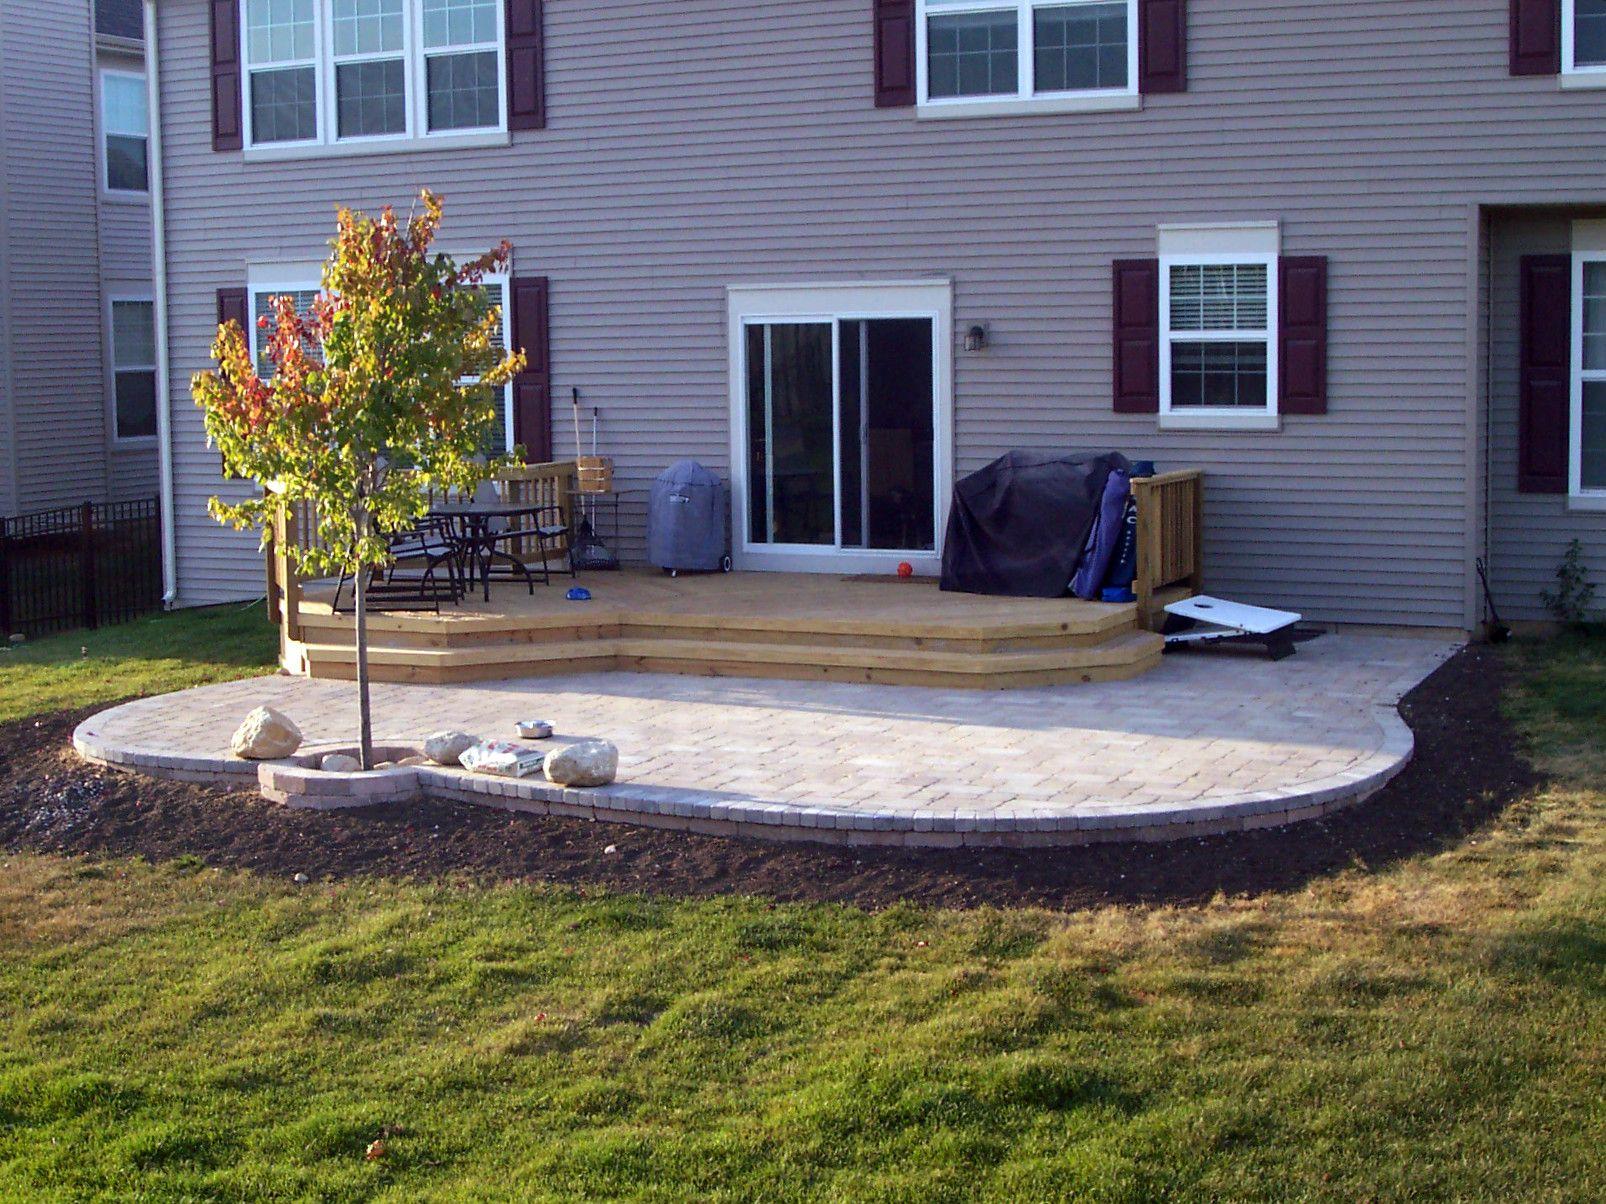 Unilock Patio and Deck Combination by Hoffman Estates IL